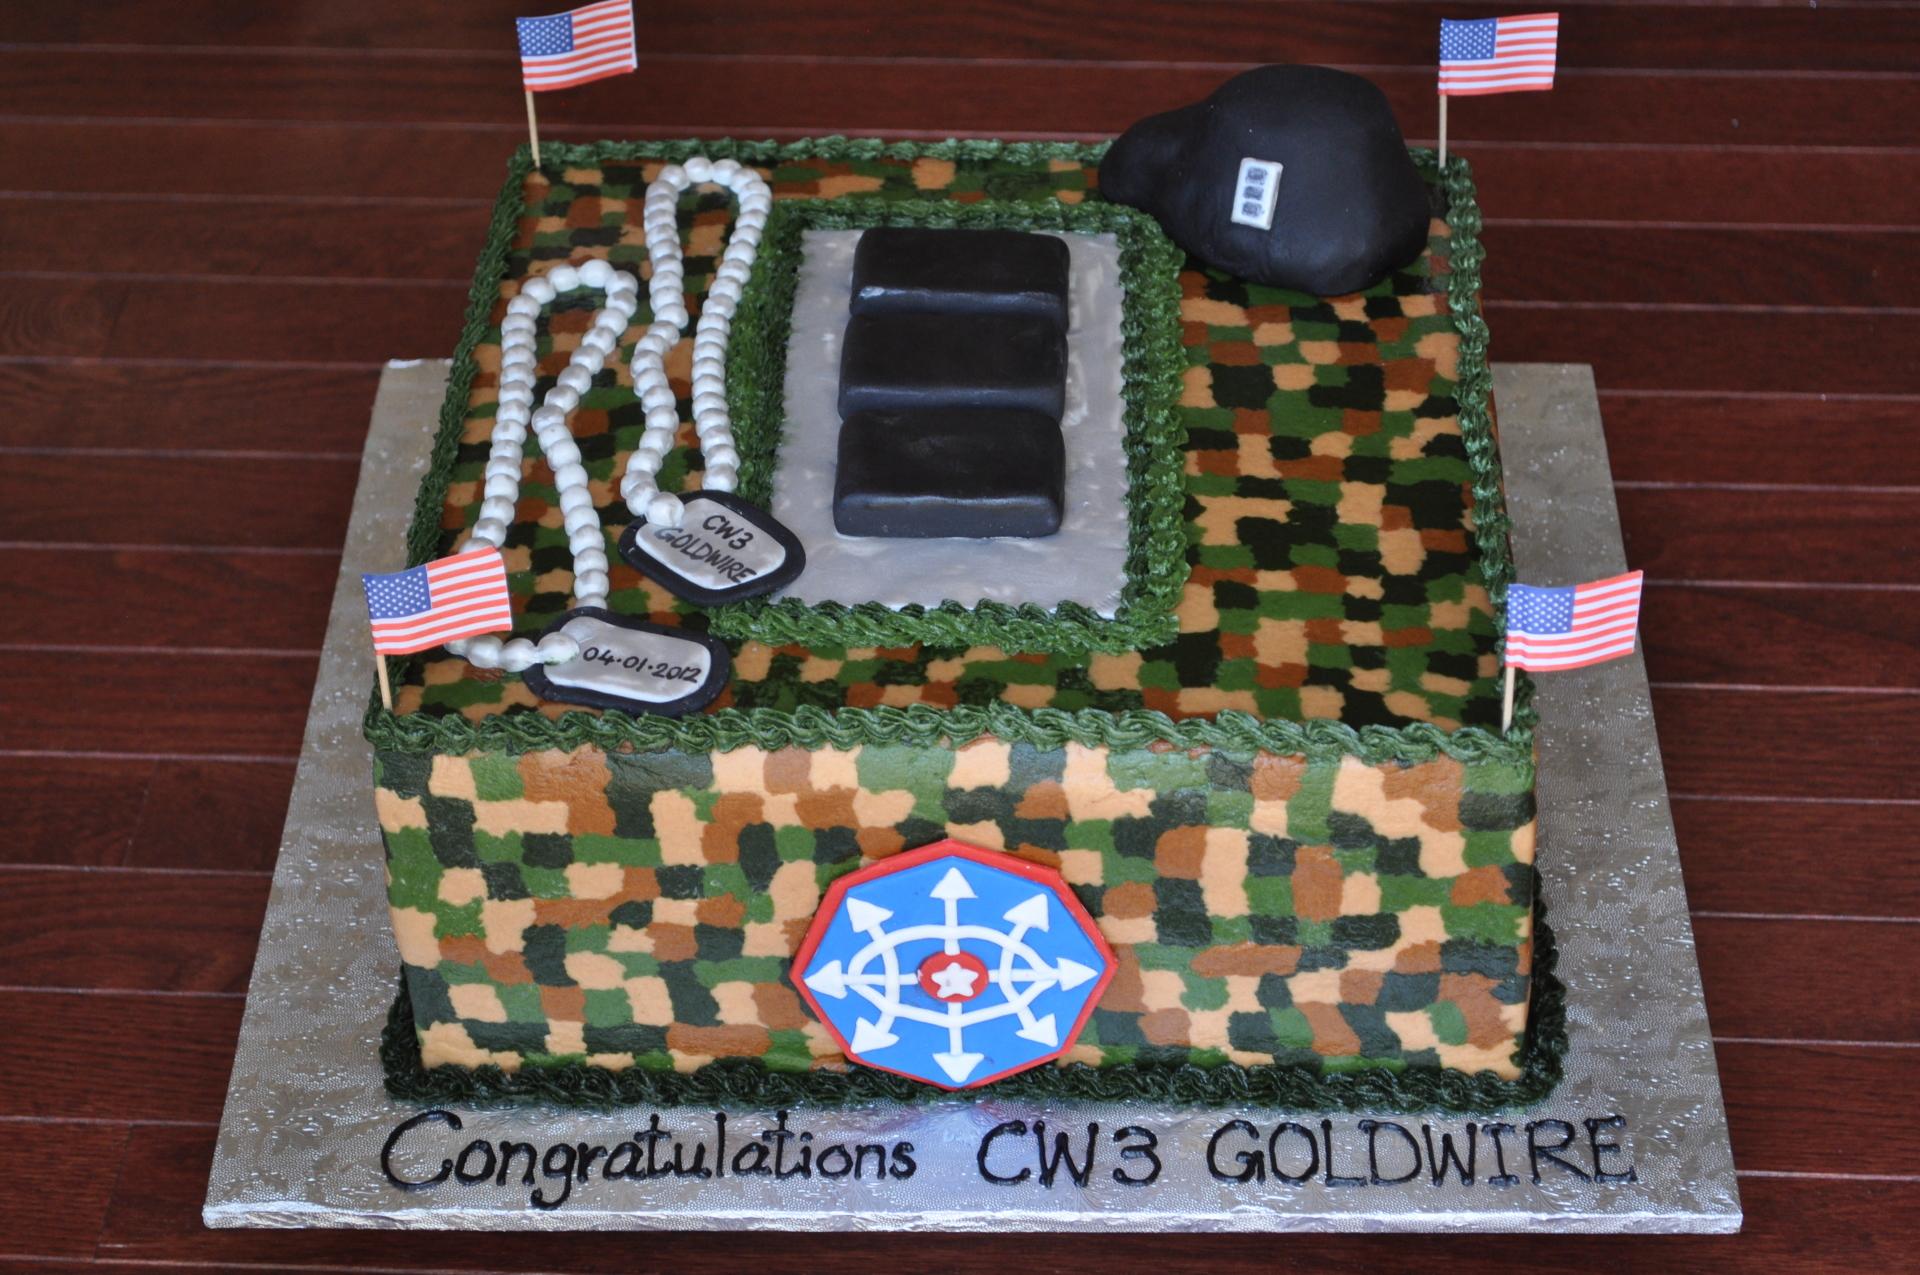 Military promotion cake, military rank cake,army cake